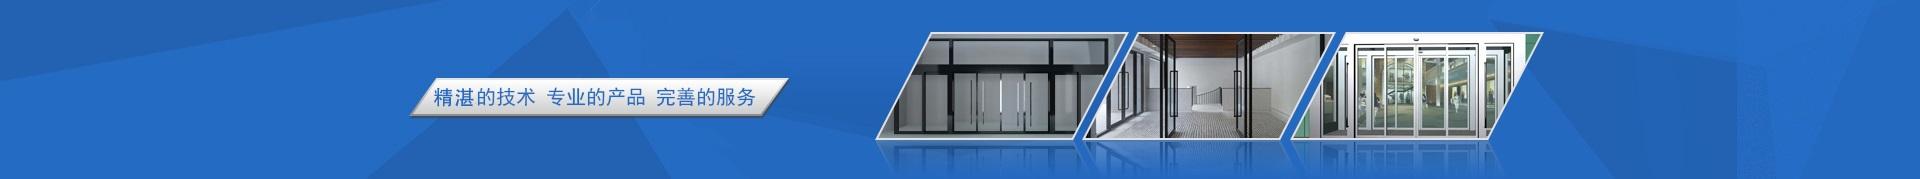 hình menu giữa web automaticdoor.vn